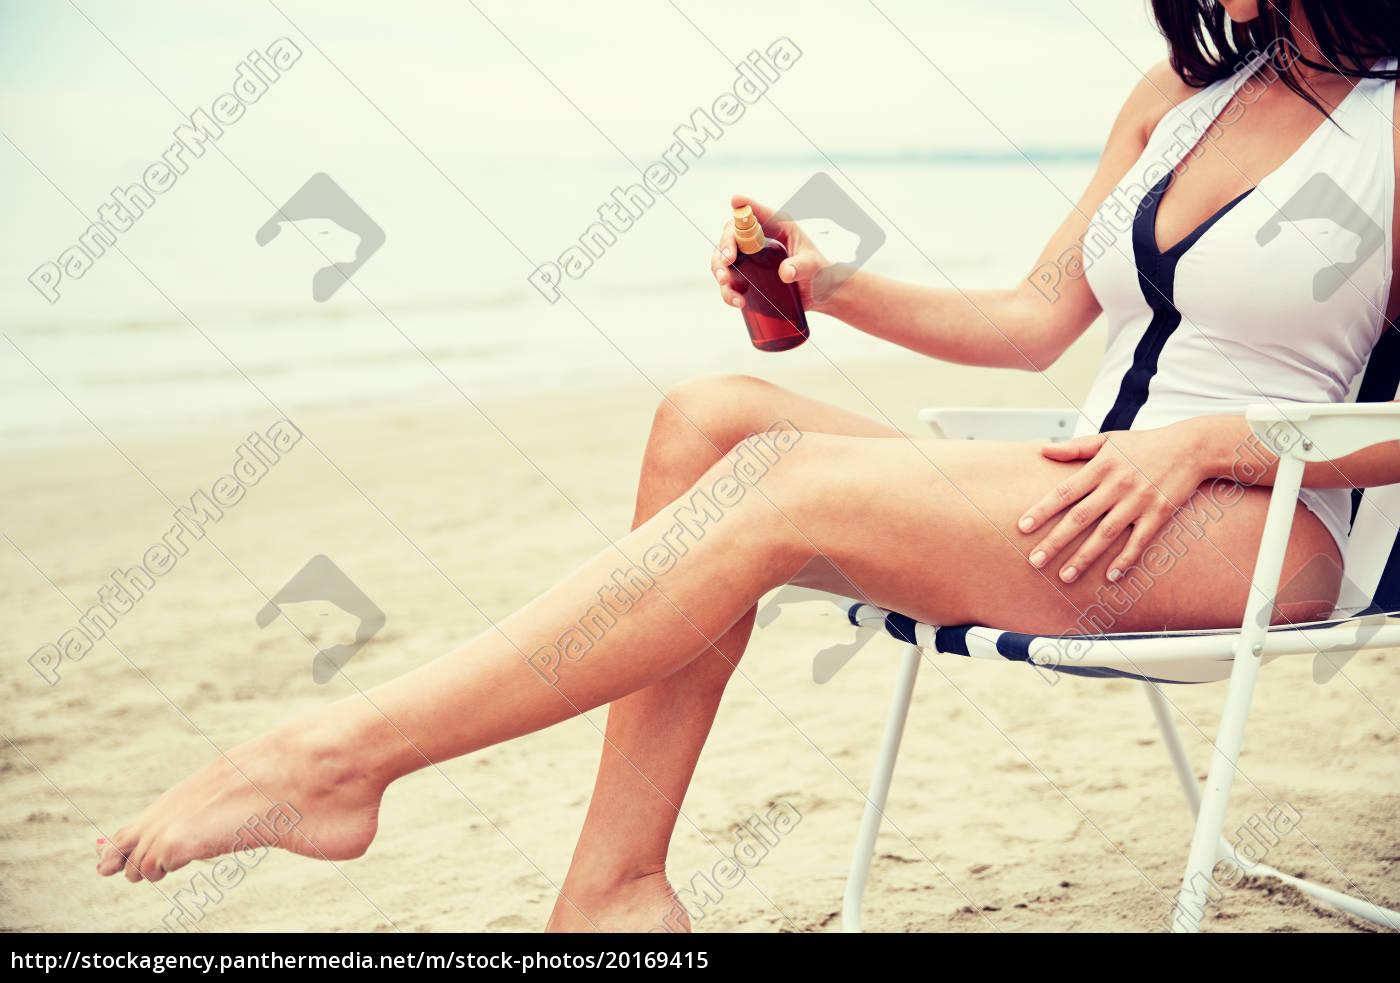 woman, sunbathing, and, spraying, sunscreen, on - 20169415